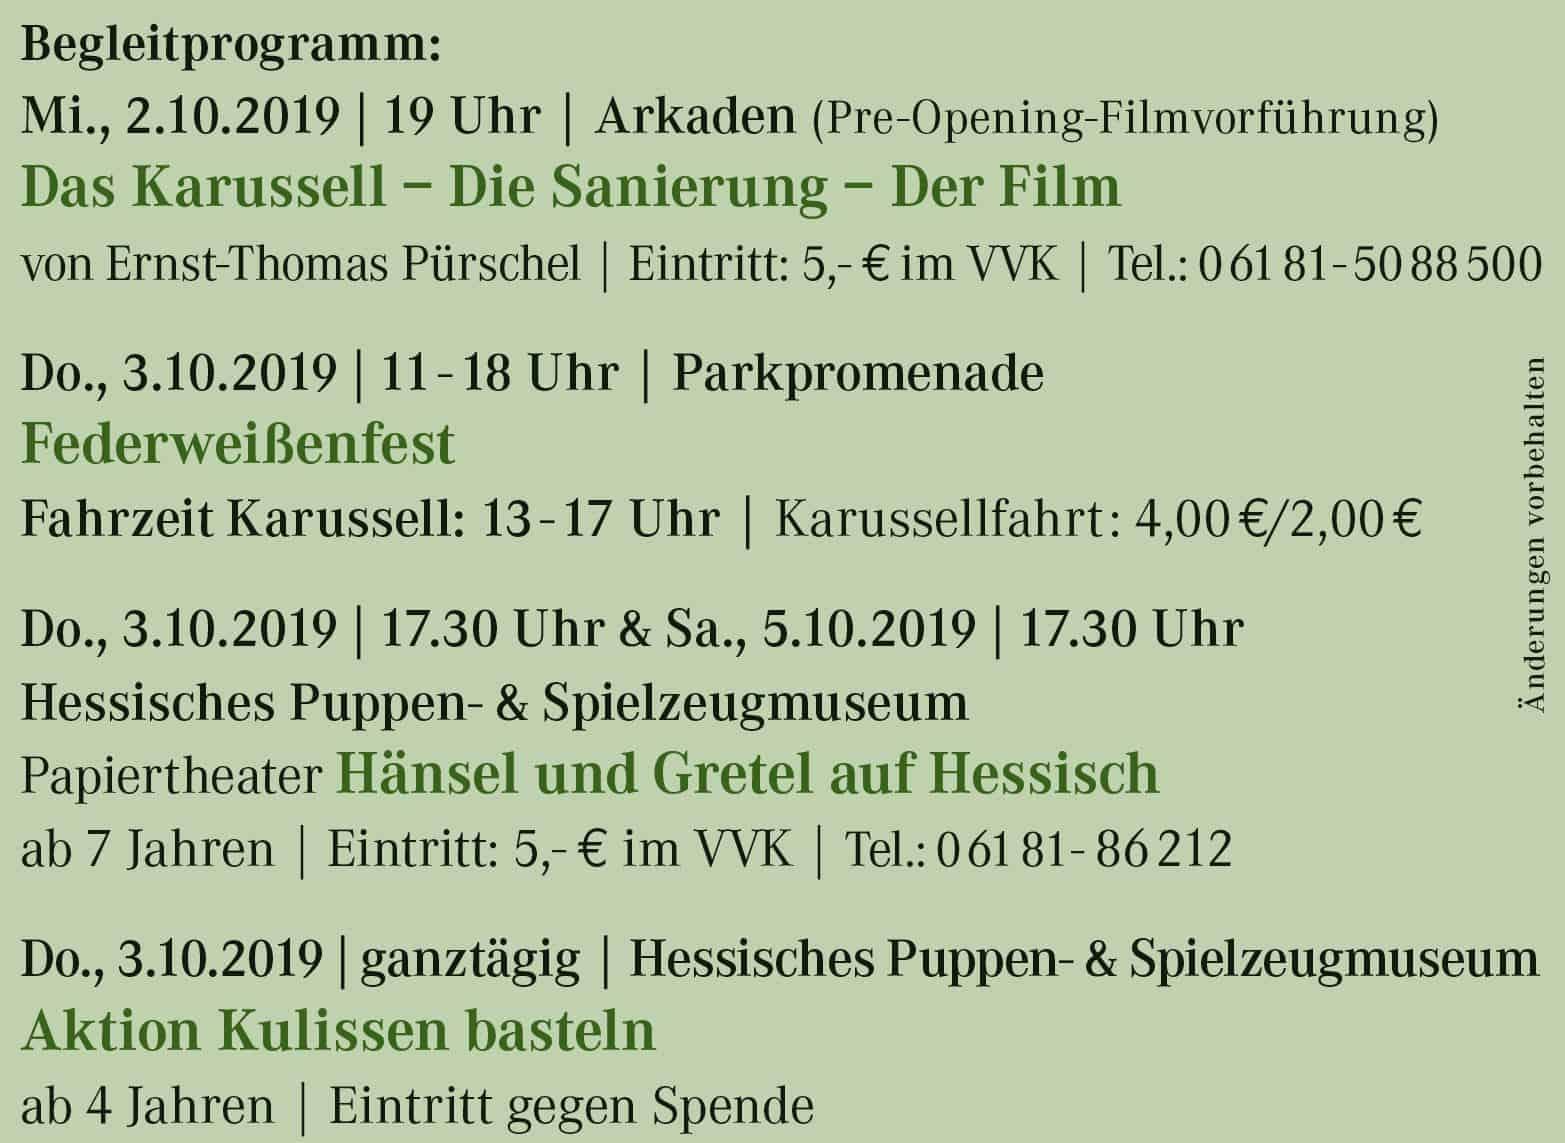 Begleitprogramm Jubiläum 2019